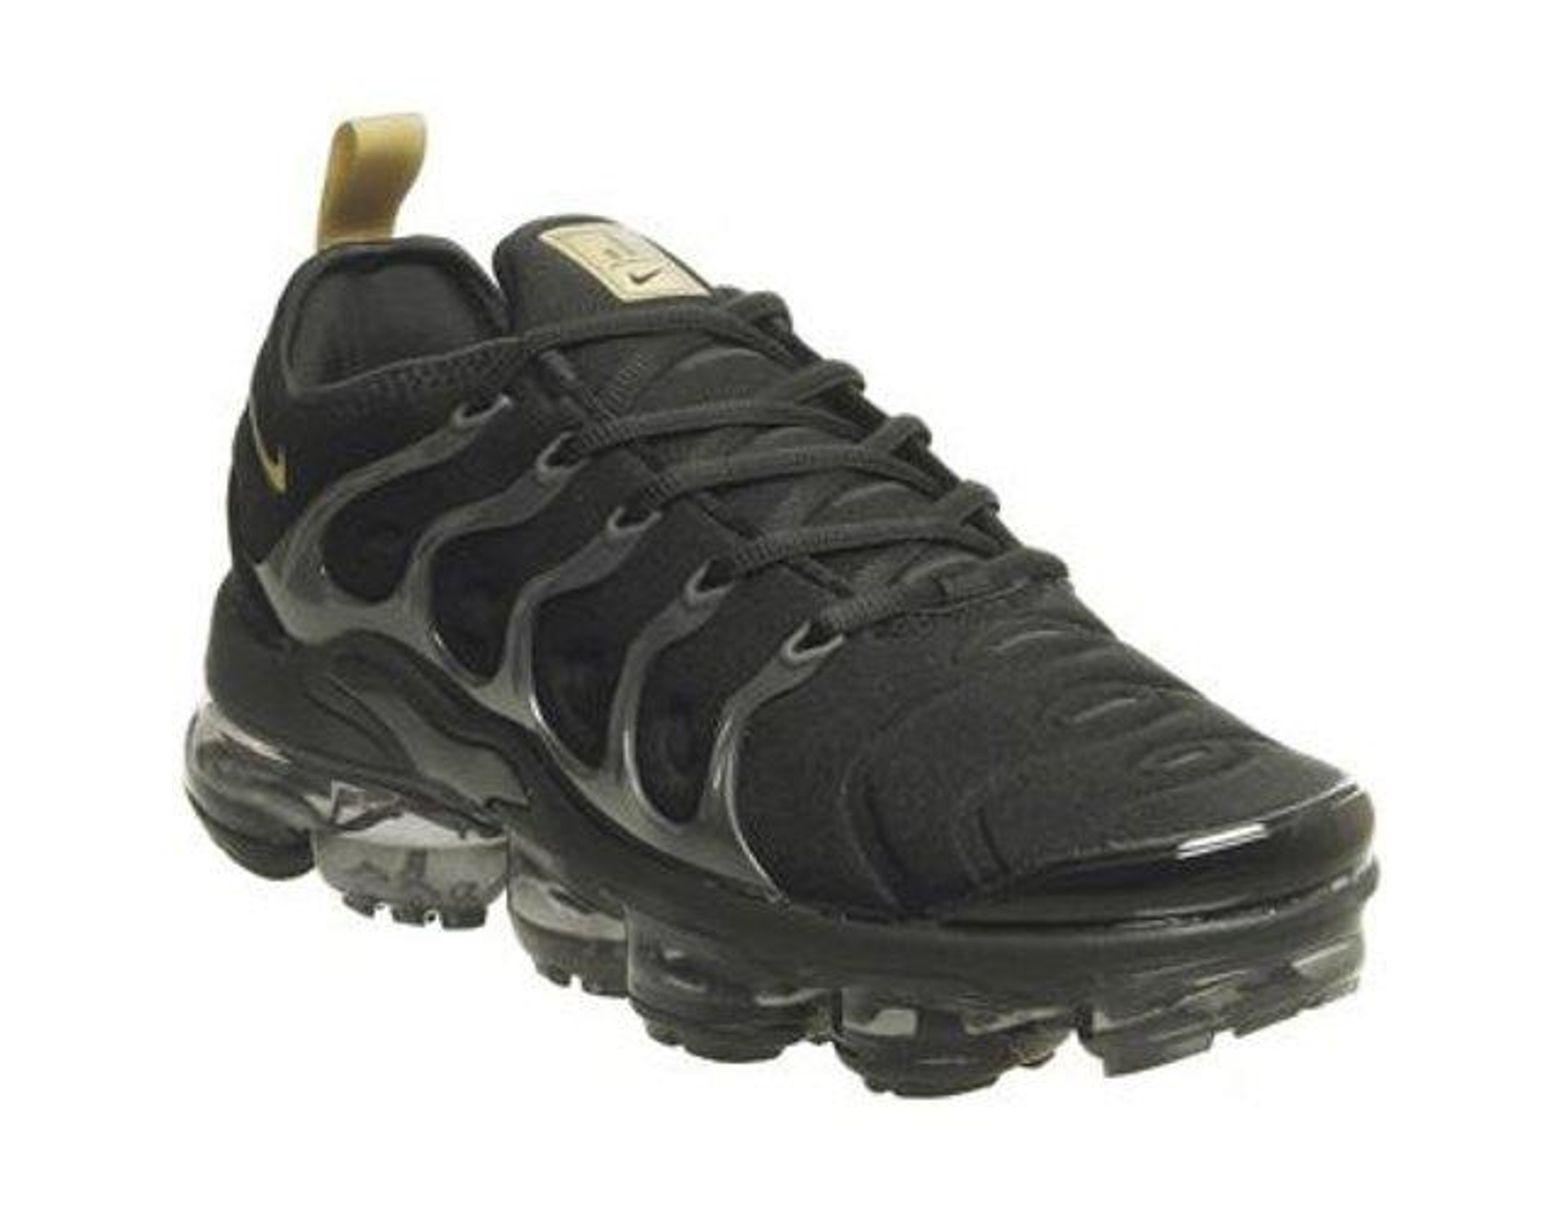 cd992c2f37541 Nike Neoprene Vapormax Air Vapormax Plus in Black for Men - Lyst